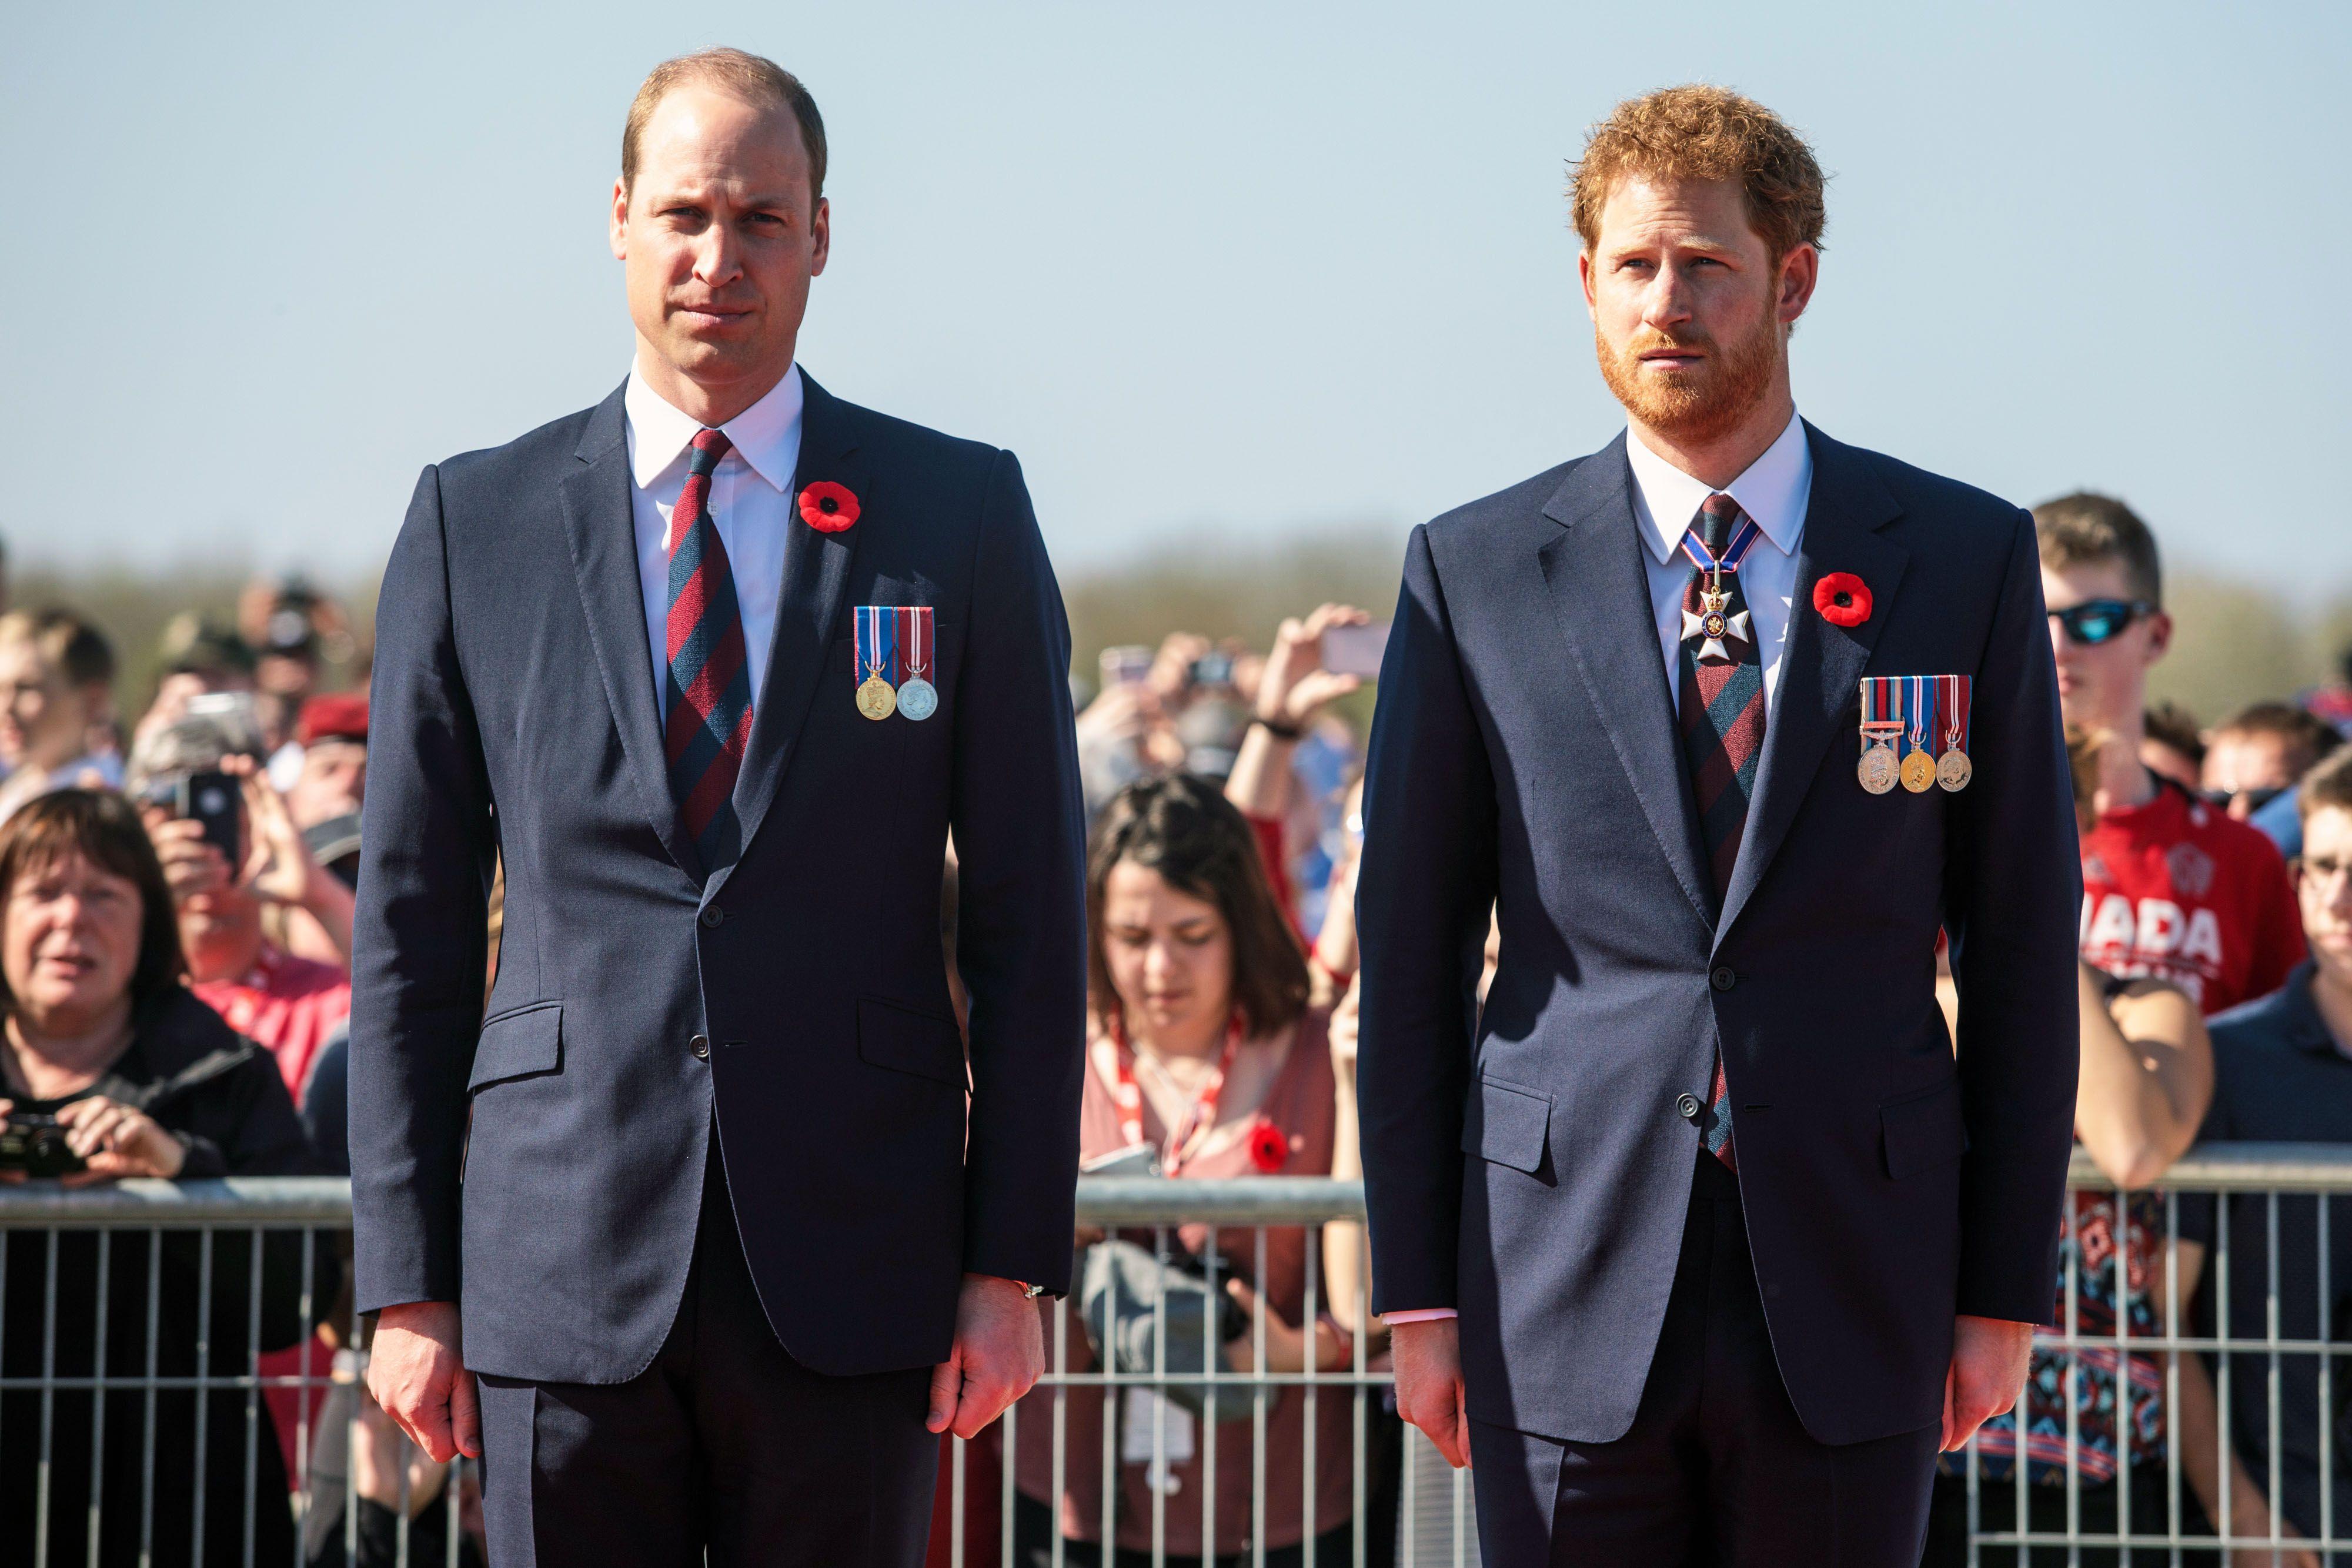 Prince William And Prince Harry Honor Princess Diana